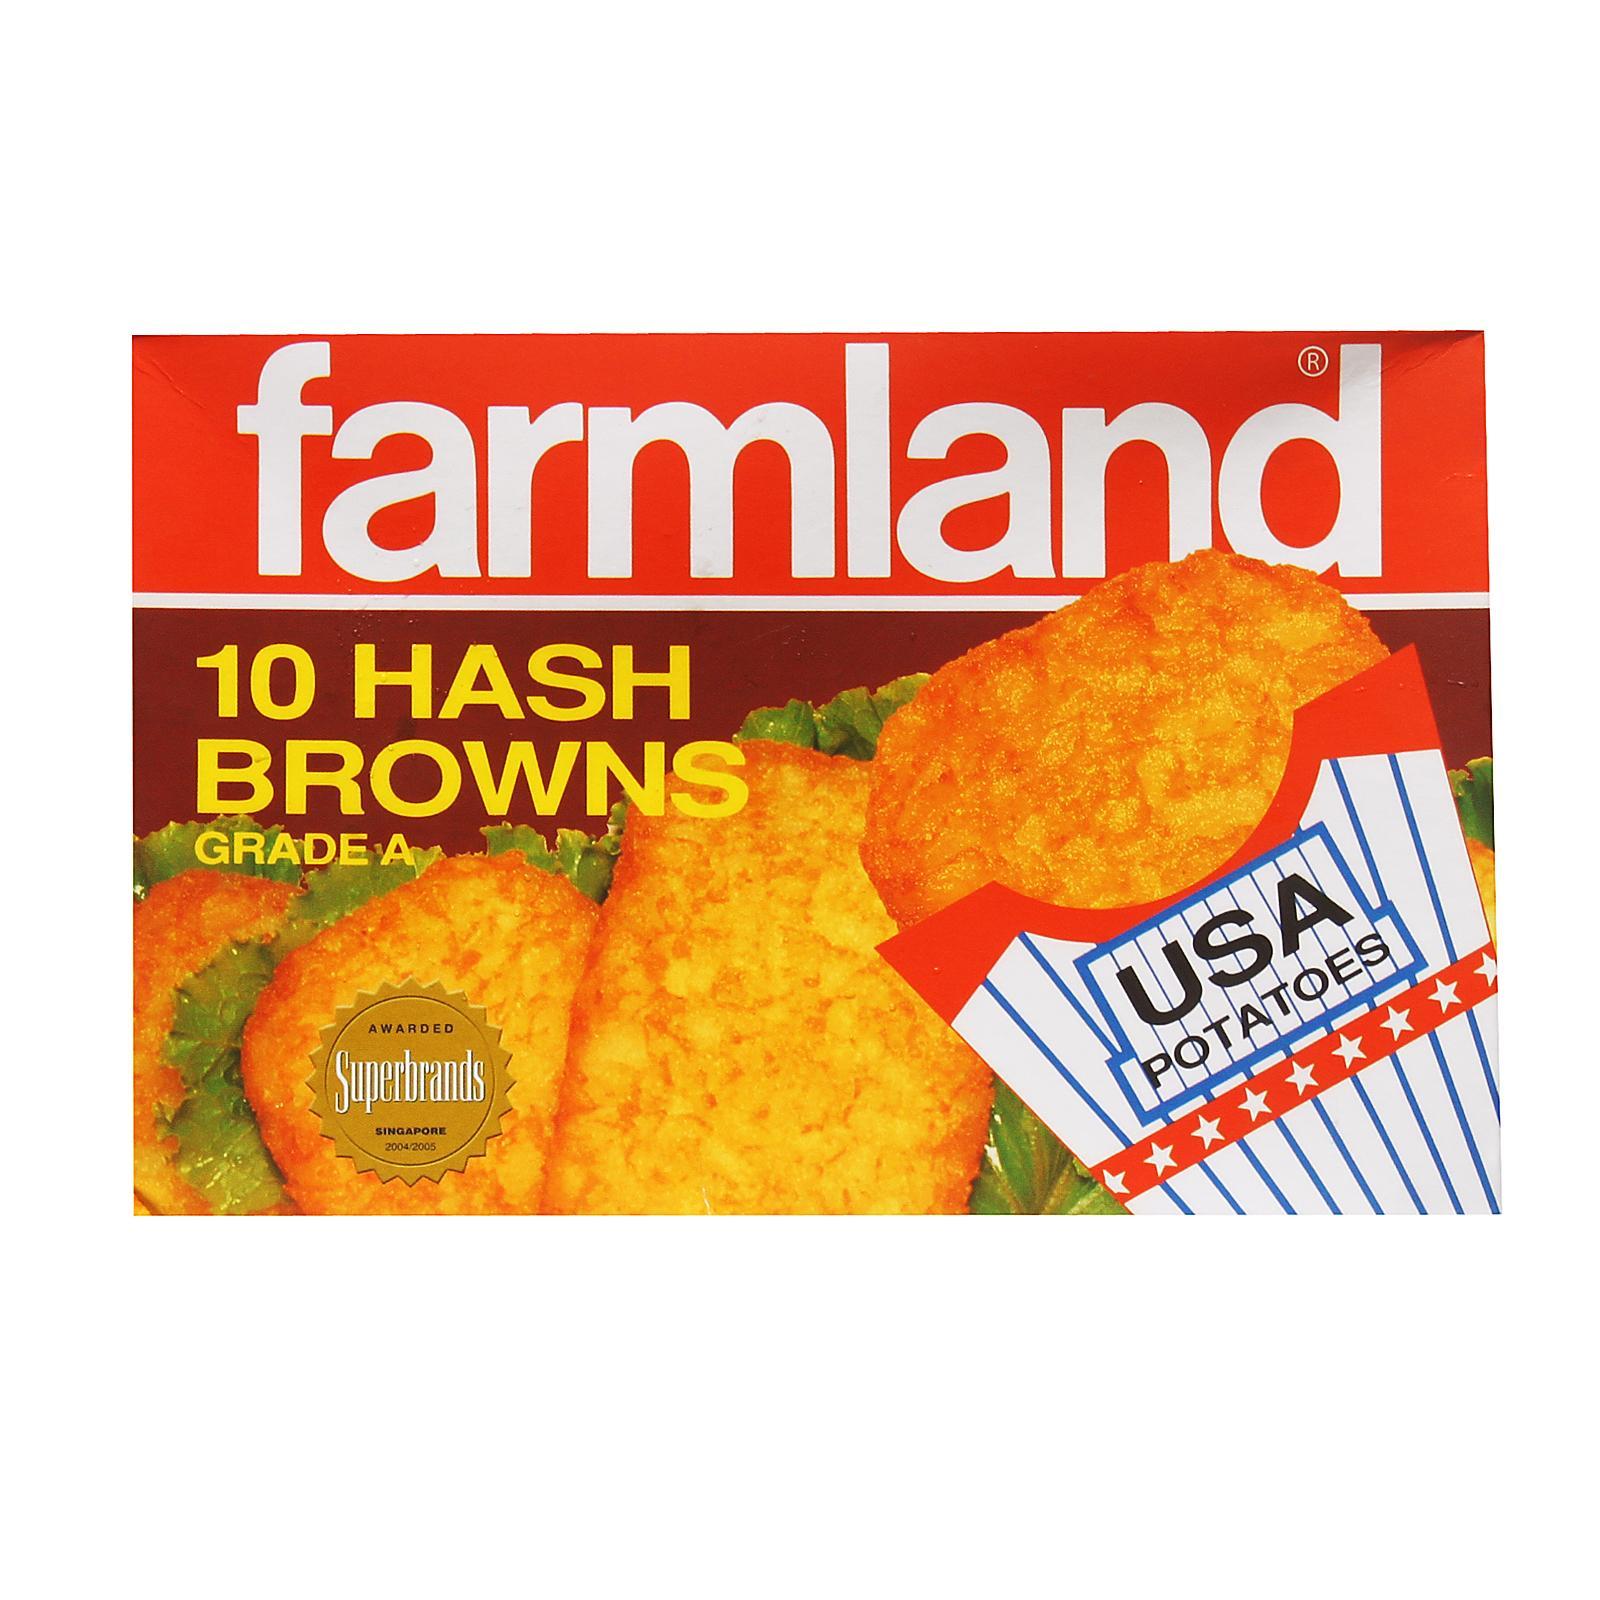 Farmland Hashbrown 10s - Frozen By Redmart.